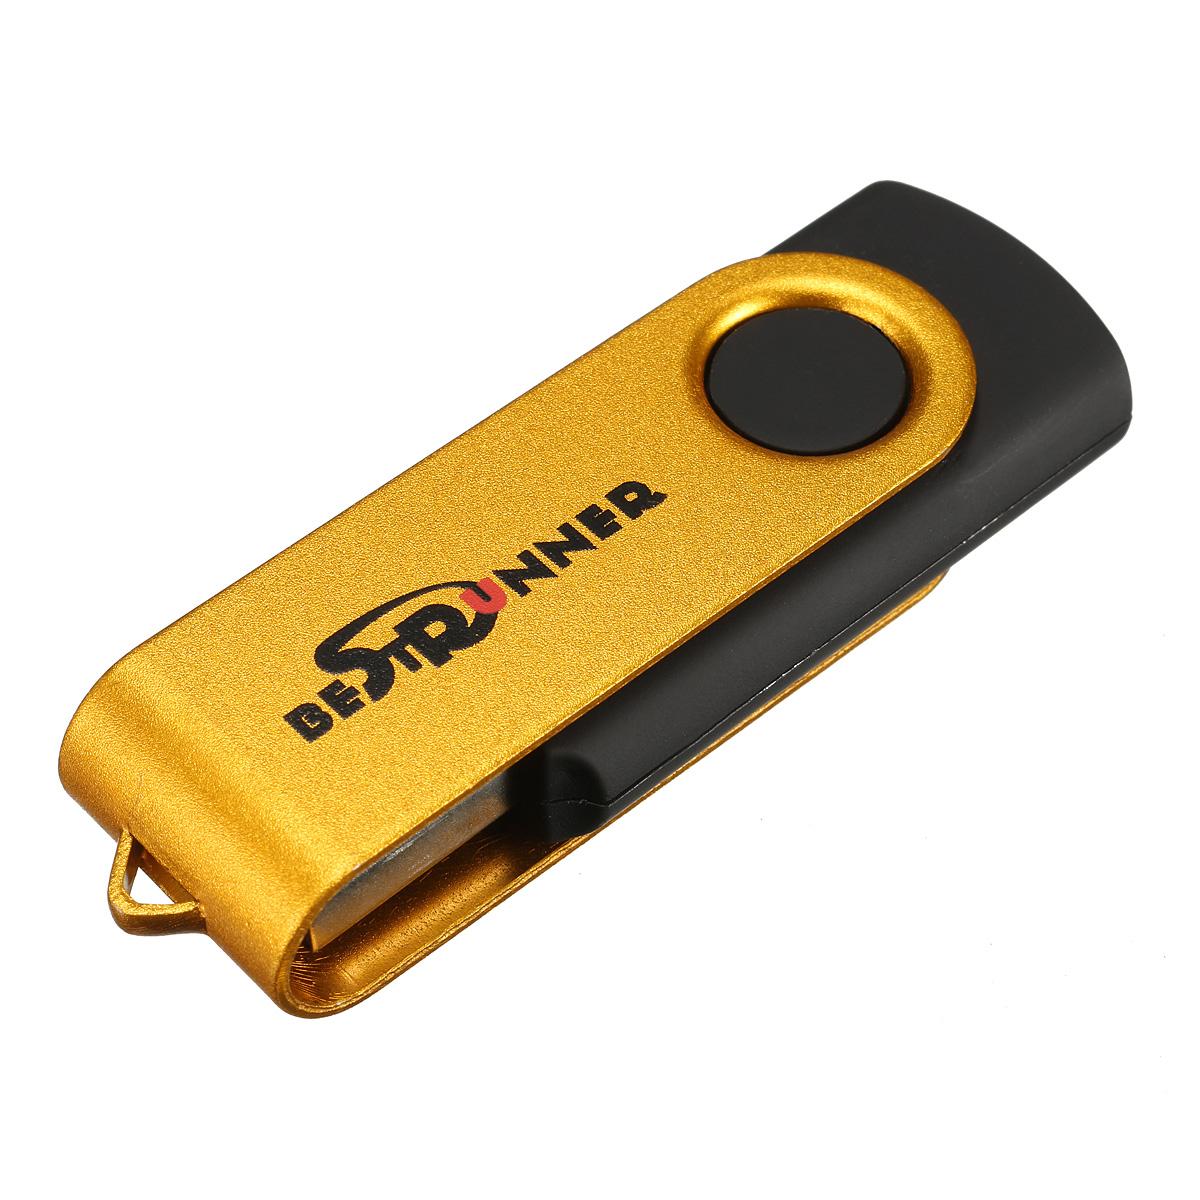 BESTRUNNER 32GB 32G 3.0 Super Fast Flash Memory Drive Thumb Pen Stick Loptop Desktop